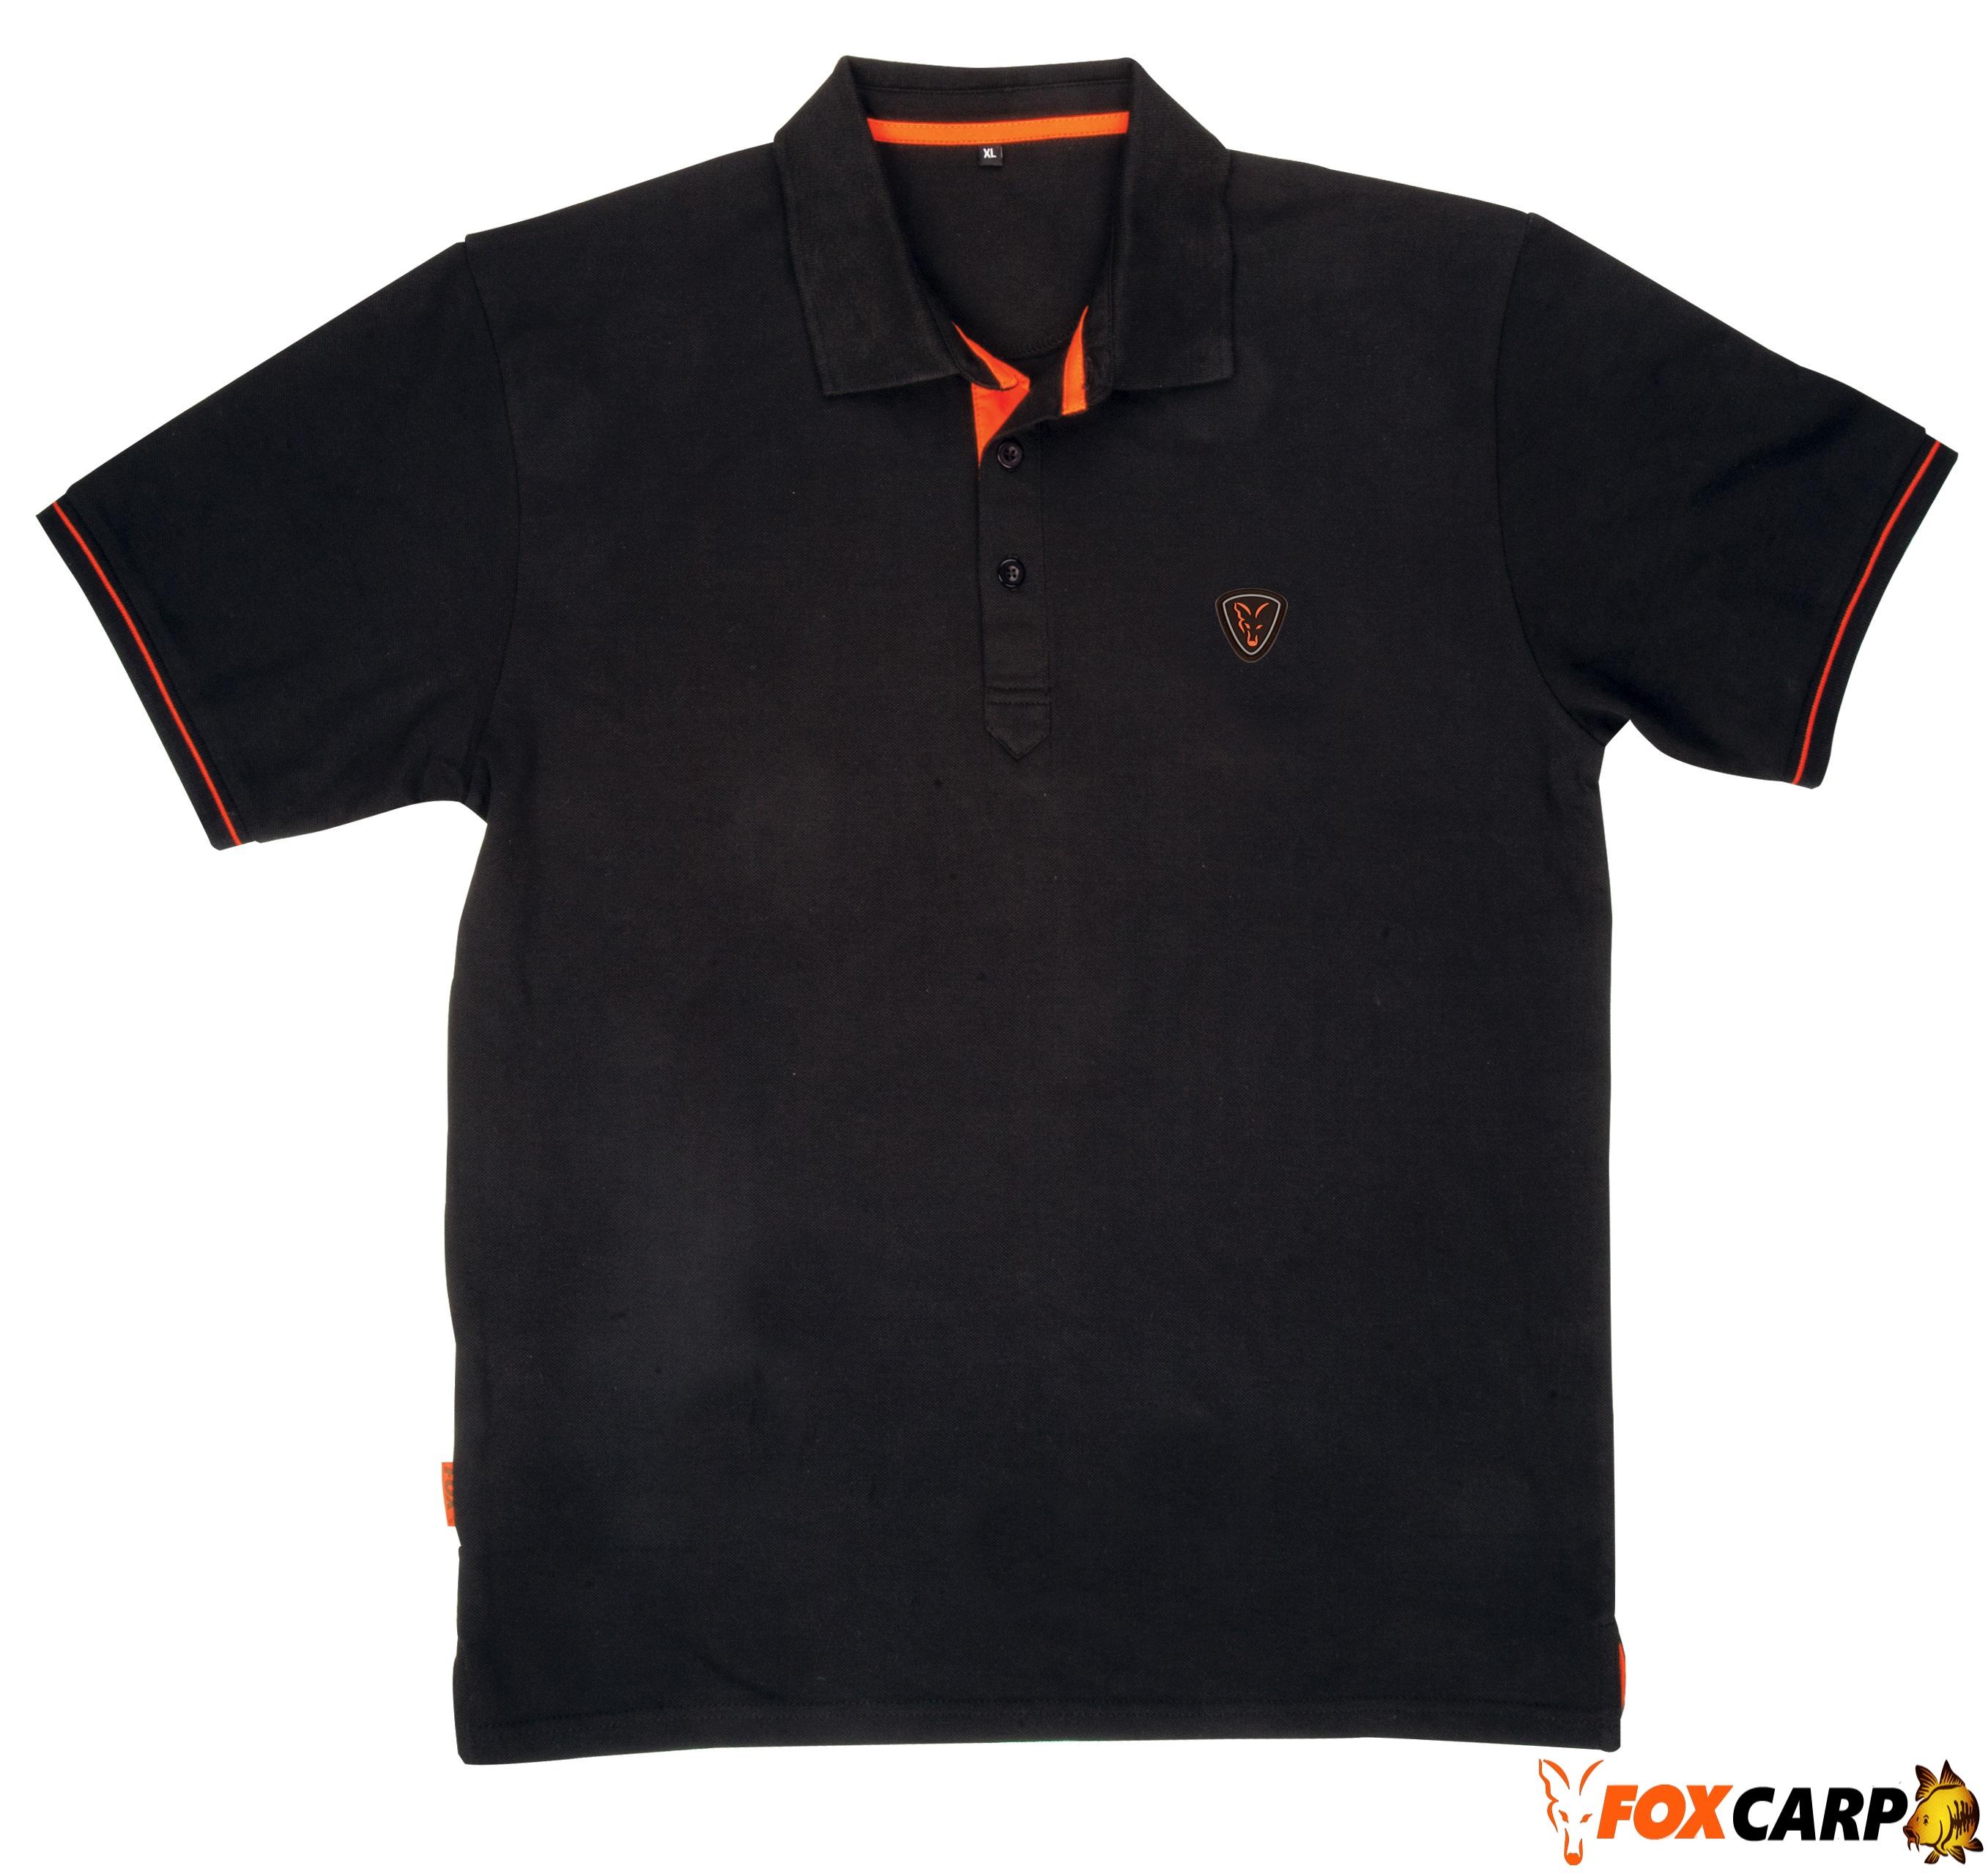 Fox тенниска Black Orange Polo Shirt